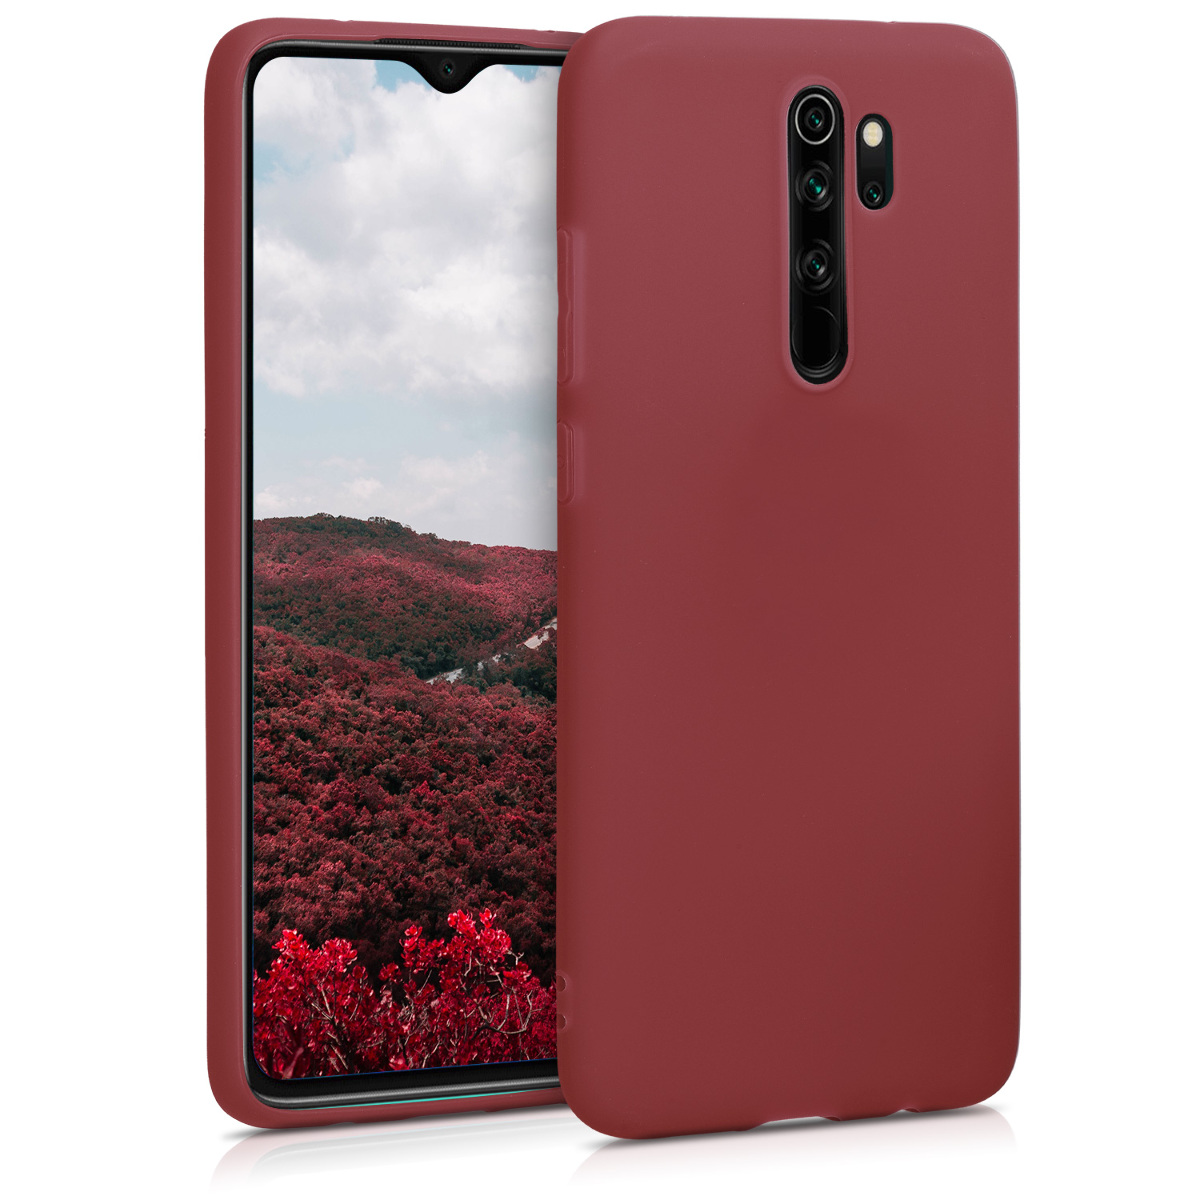 KW Θήκη Σιλικόνης Xiaomi Redmi Note 8 Pro - Maroon Red (50242.160)